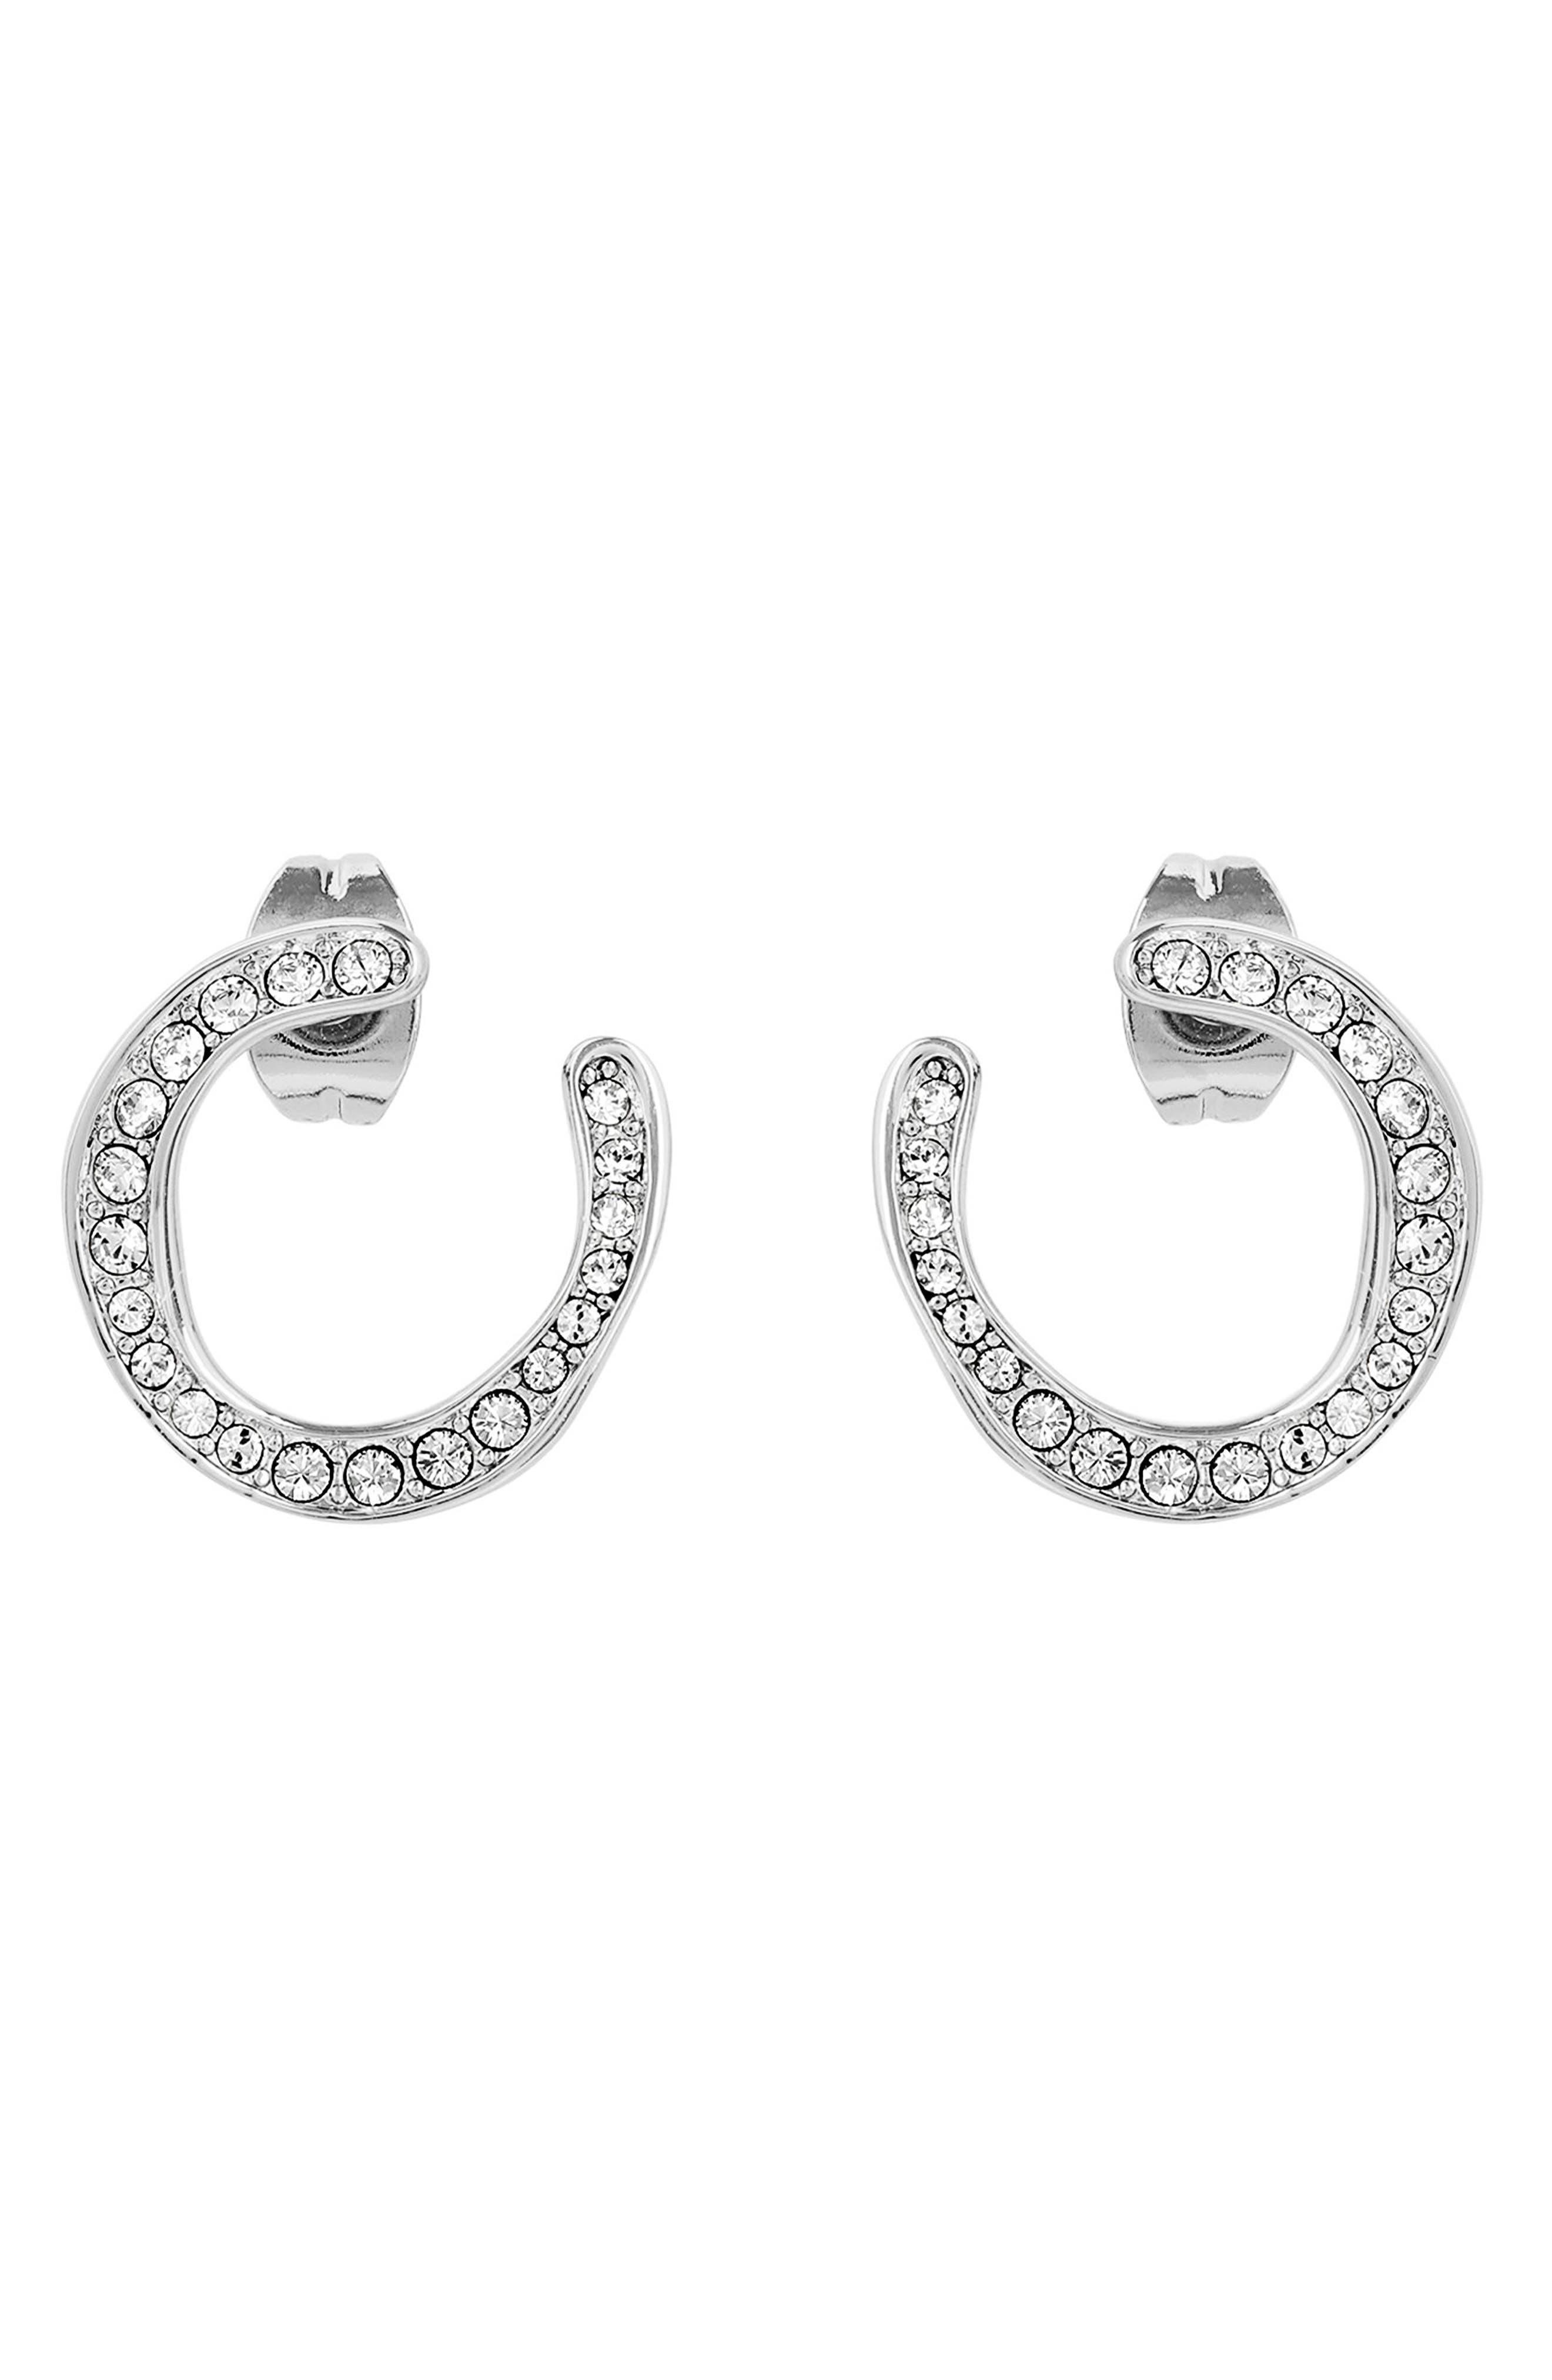 ADORE Organic Circle Hoop Rhinestone Earrings in Silver